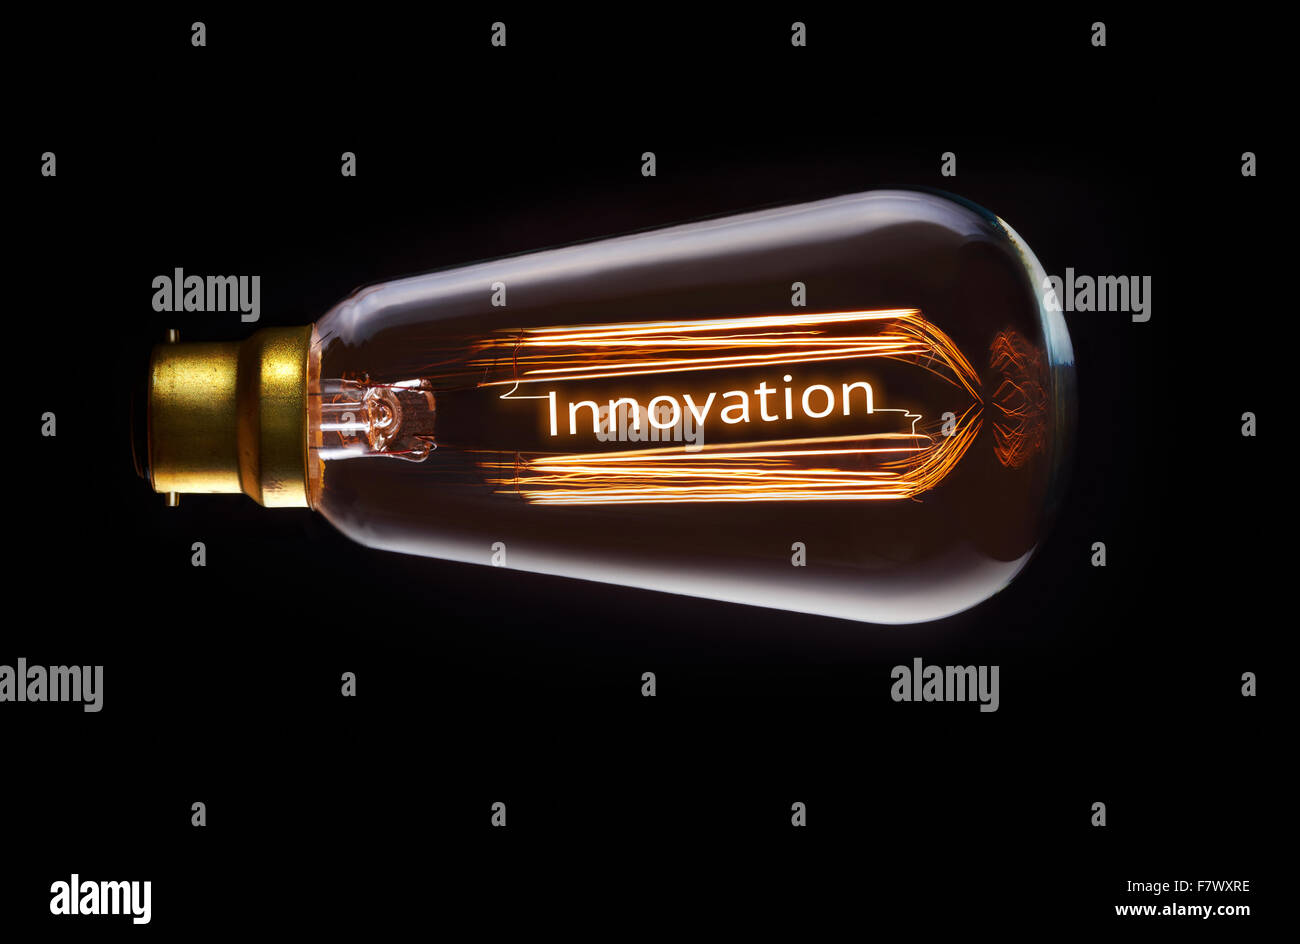 Innovation-Konzept in ein Filament-Glühbirne. Stockfoto